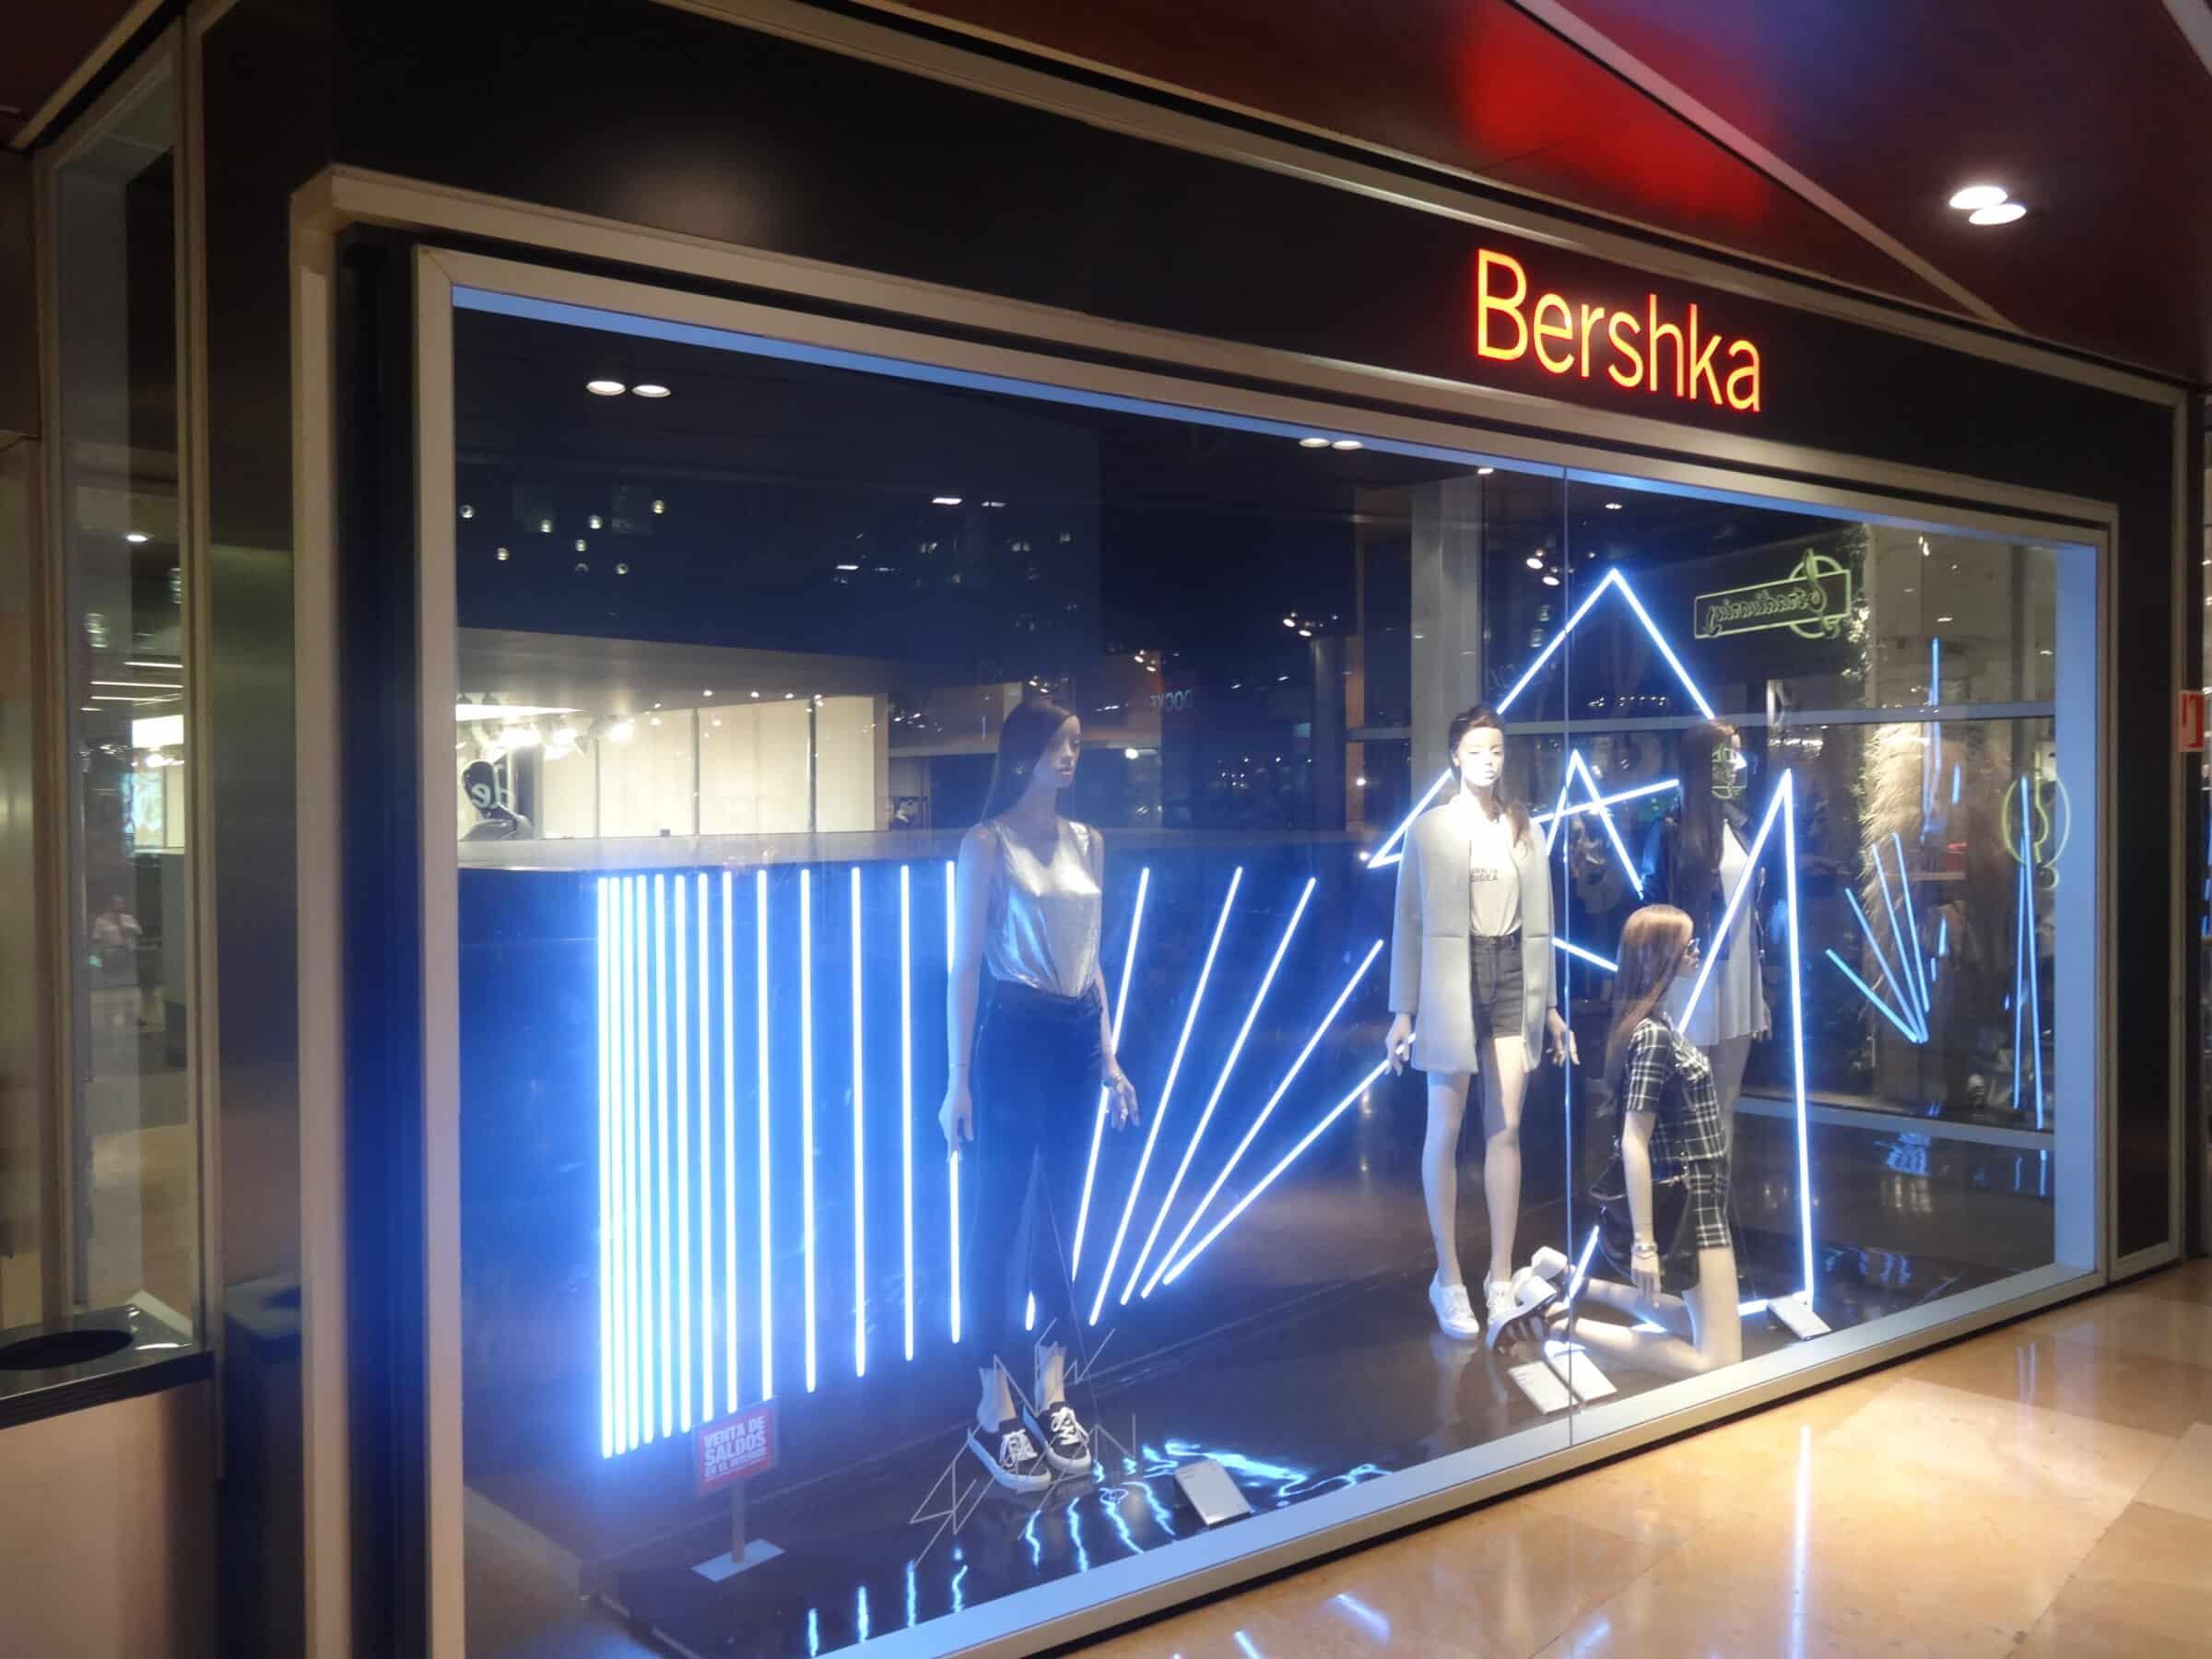 Bershka lavora con noi